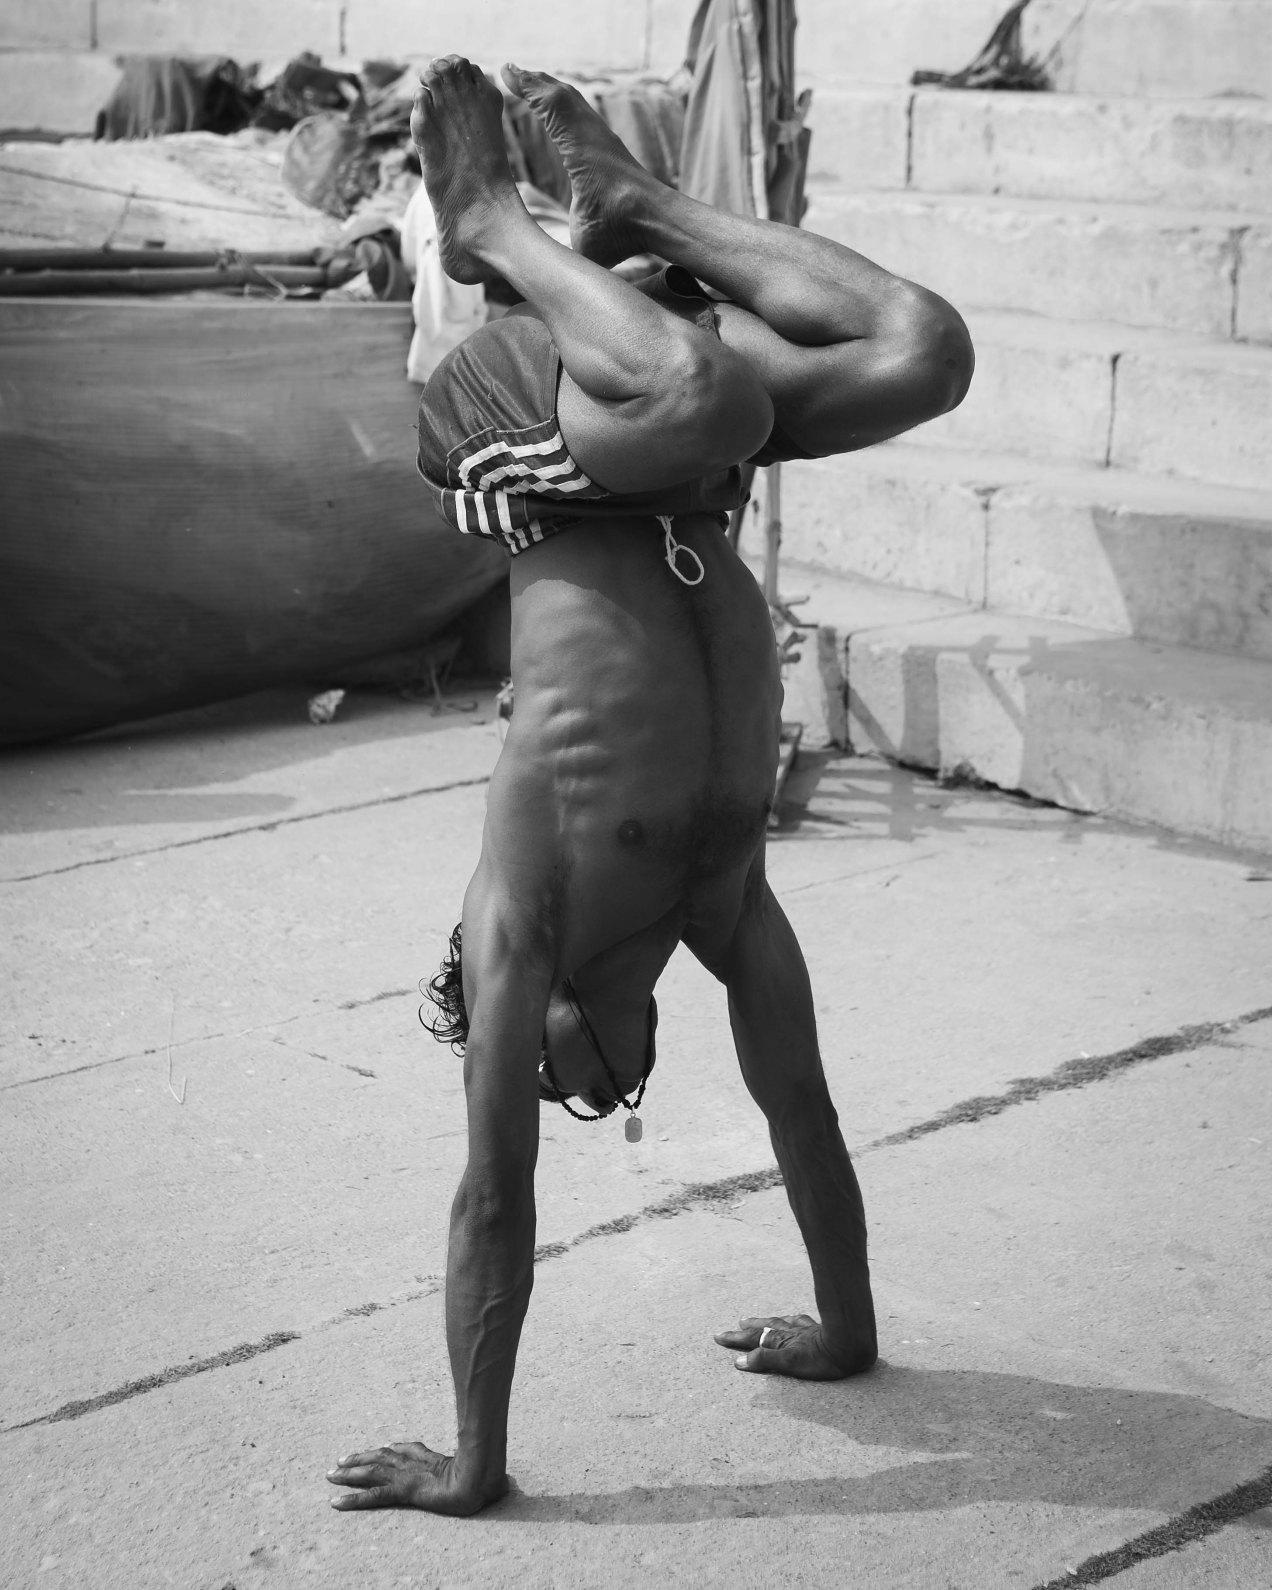 Yoga, Varanasi, 2008, Inde, gildalliere